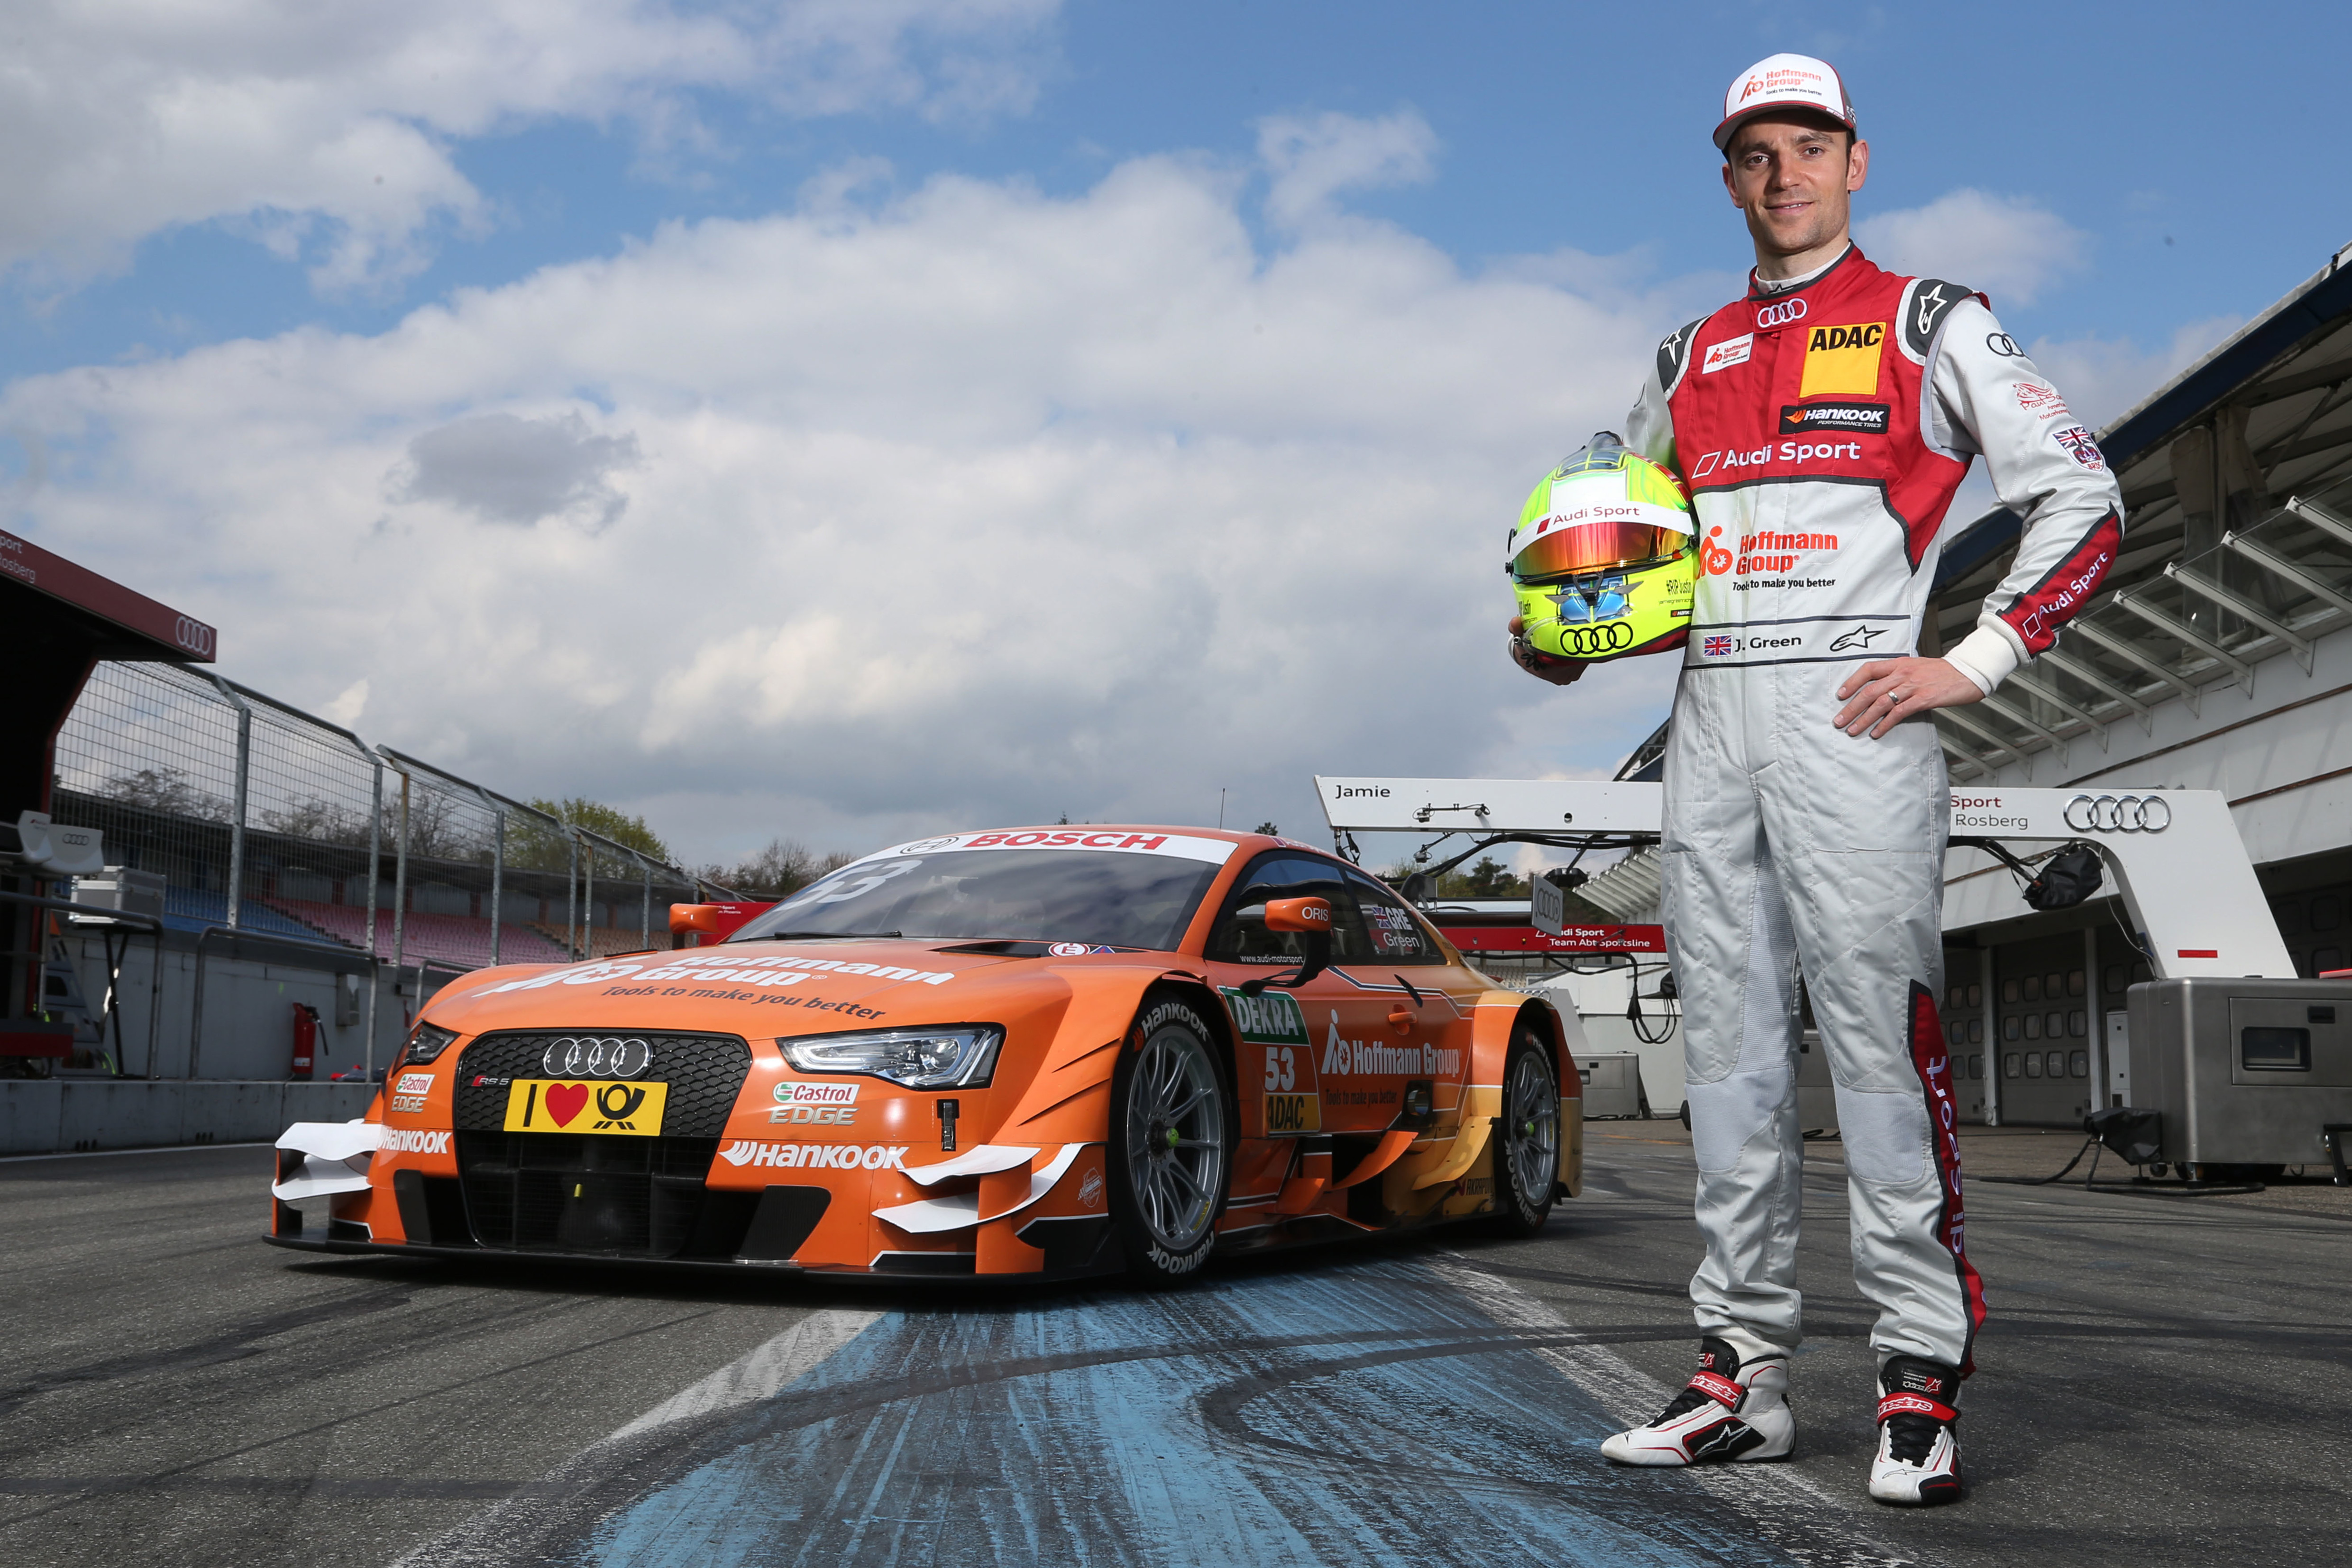 #53 Jamie Green Hoffmann Group Audi RS5 DTM